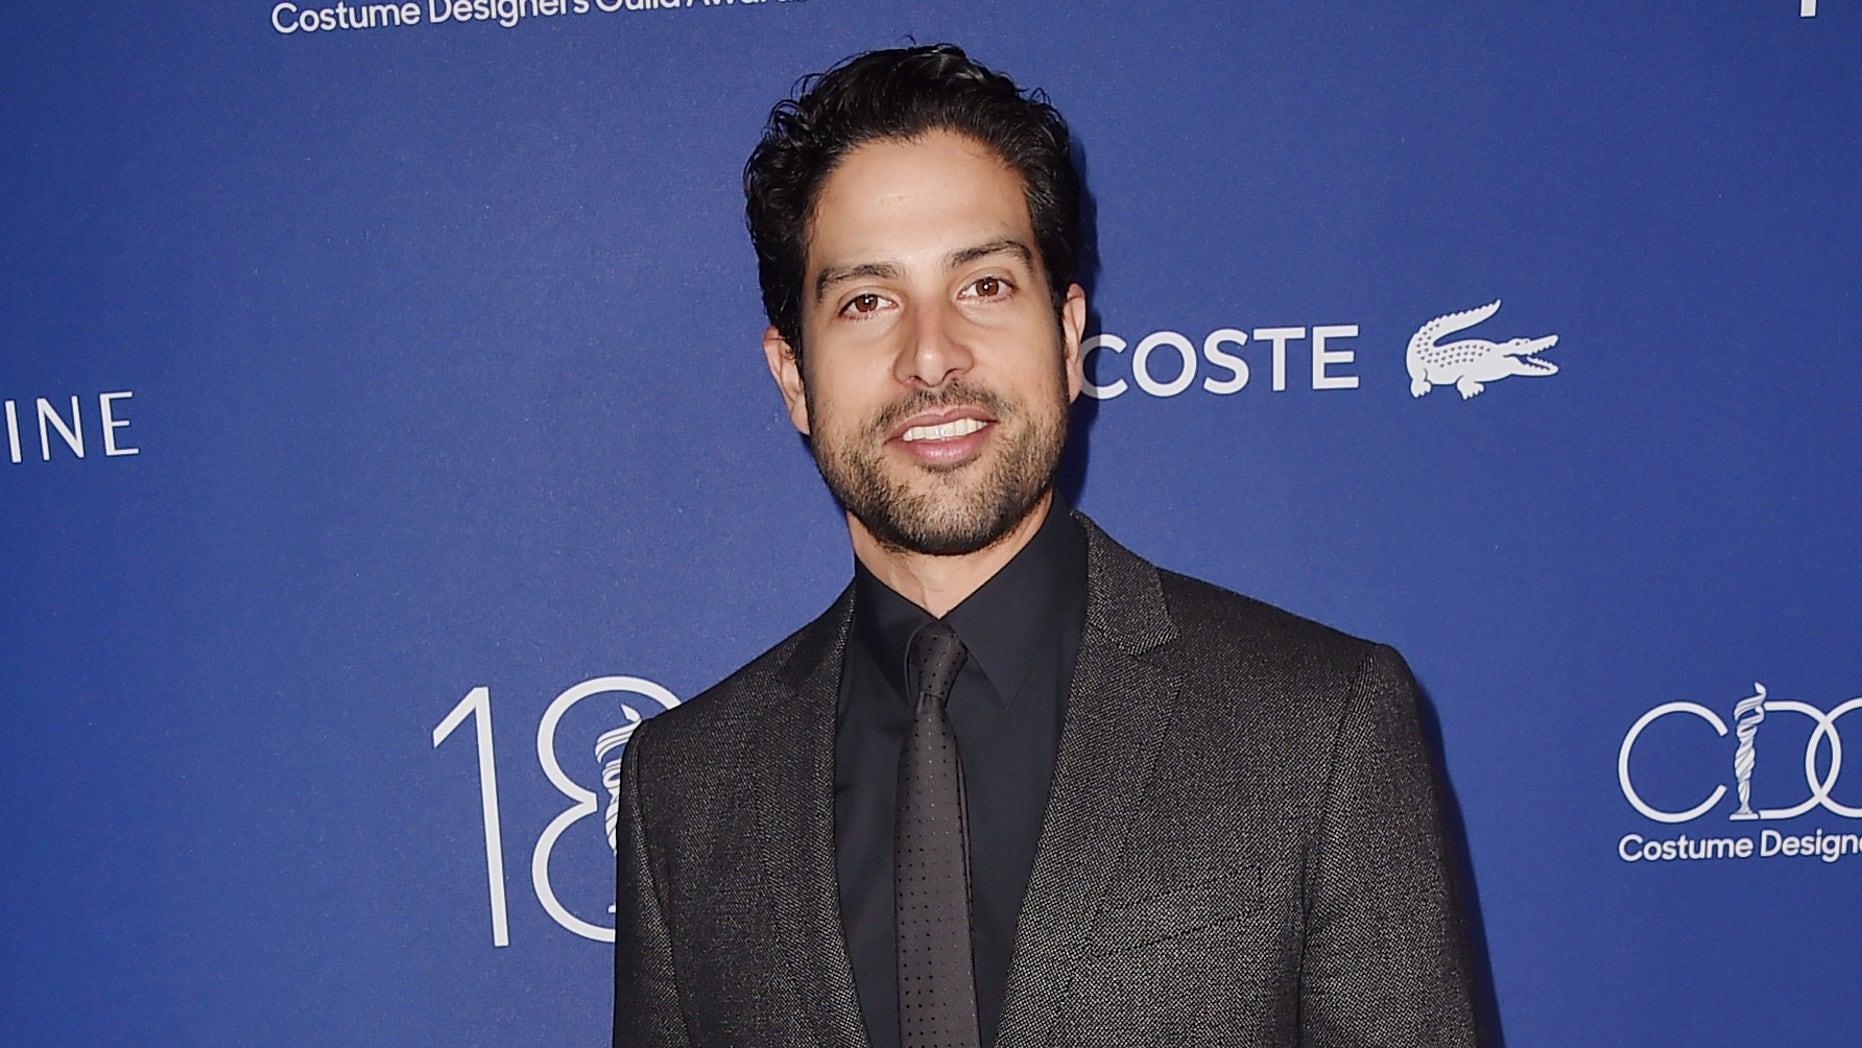 Adam Rodríguez on February 23, 2016 in Beverly Hills, California.